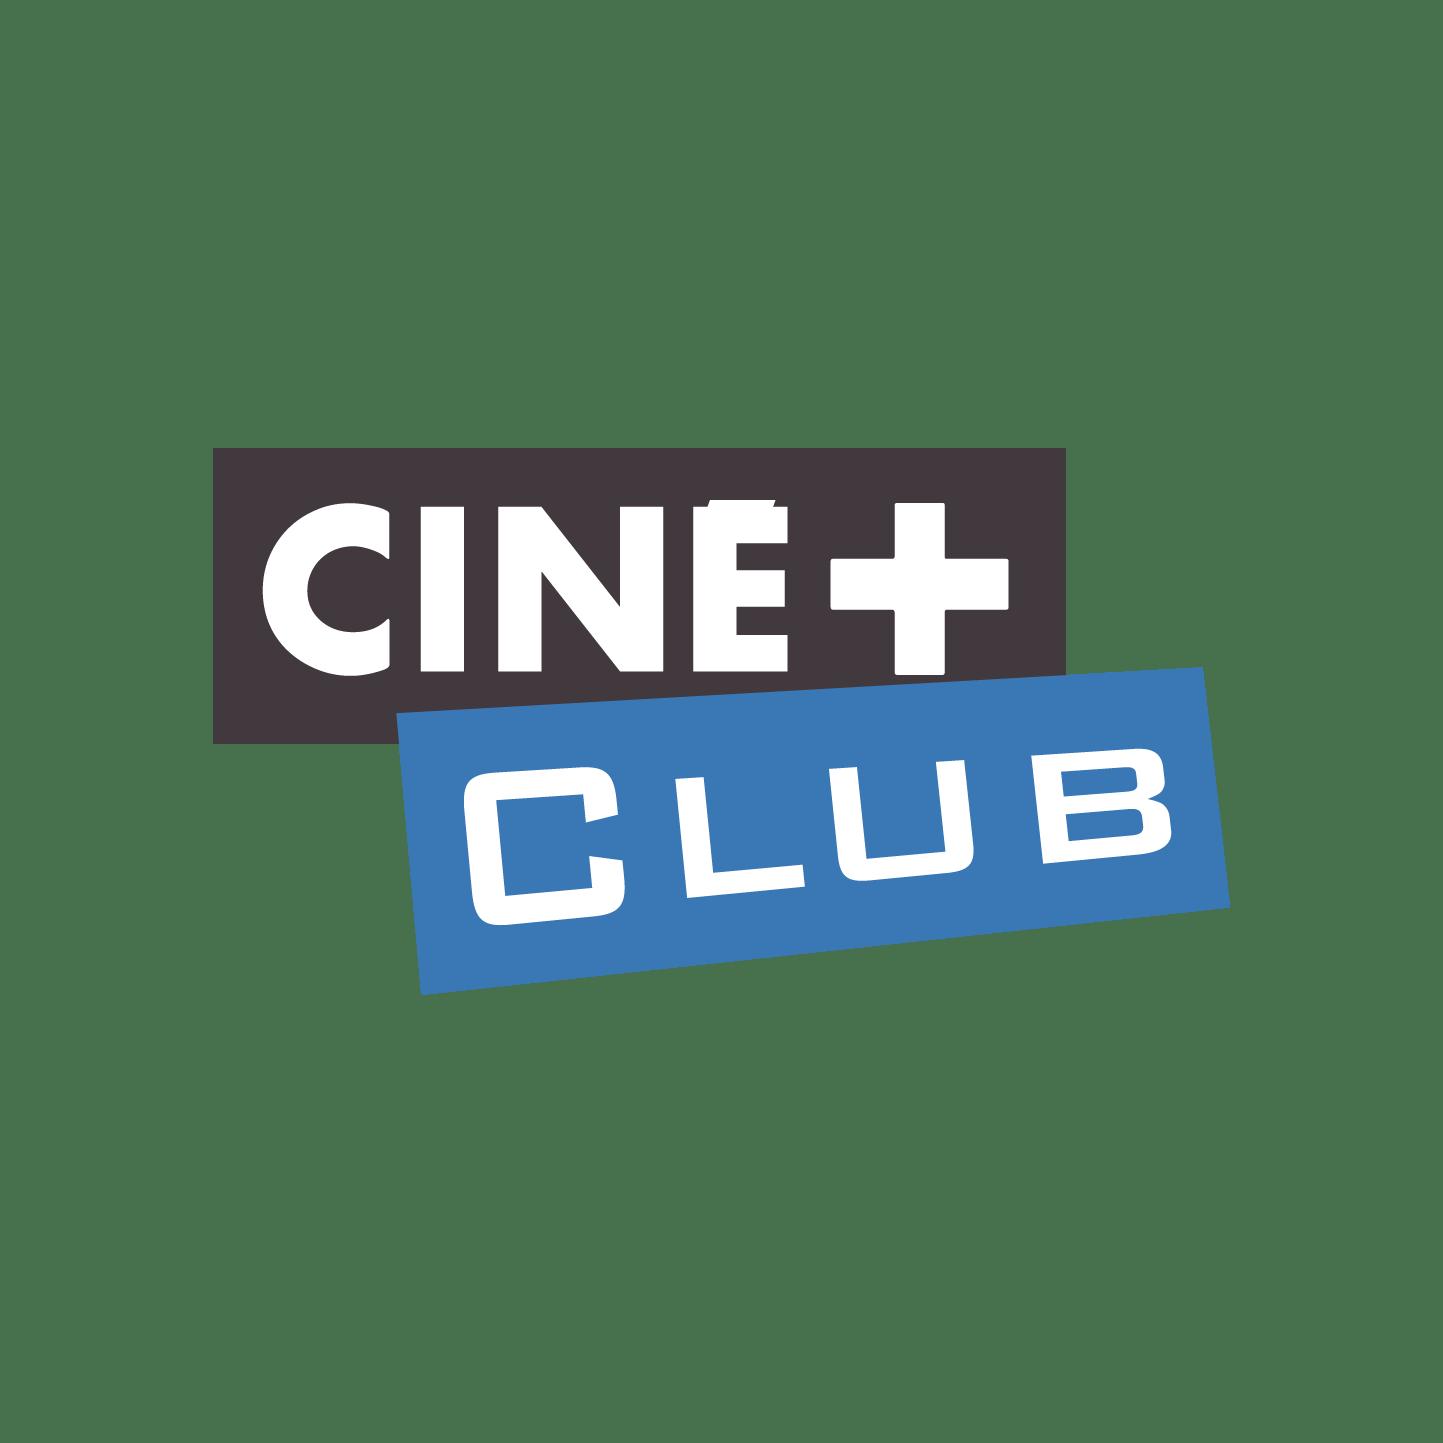 logo Ciné + club